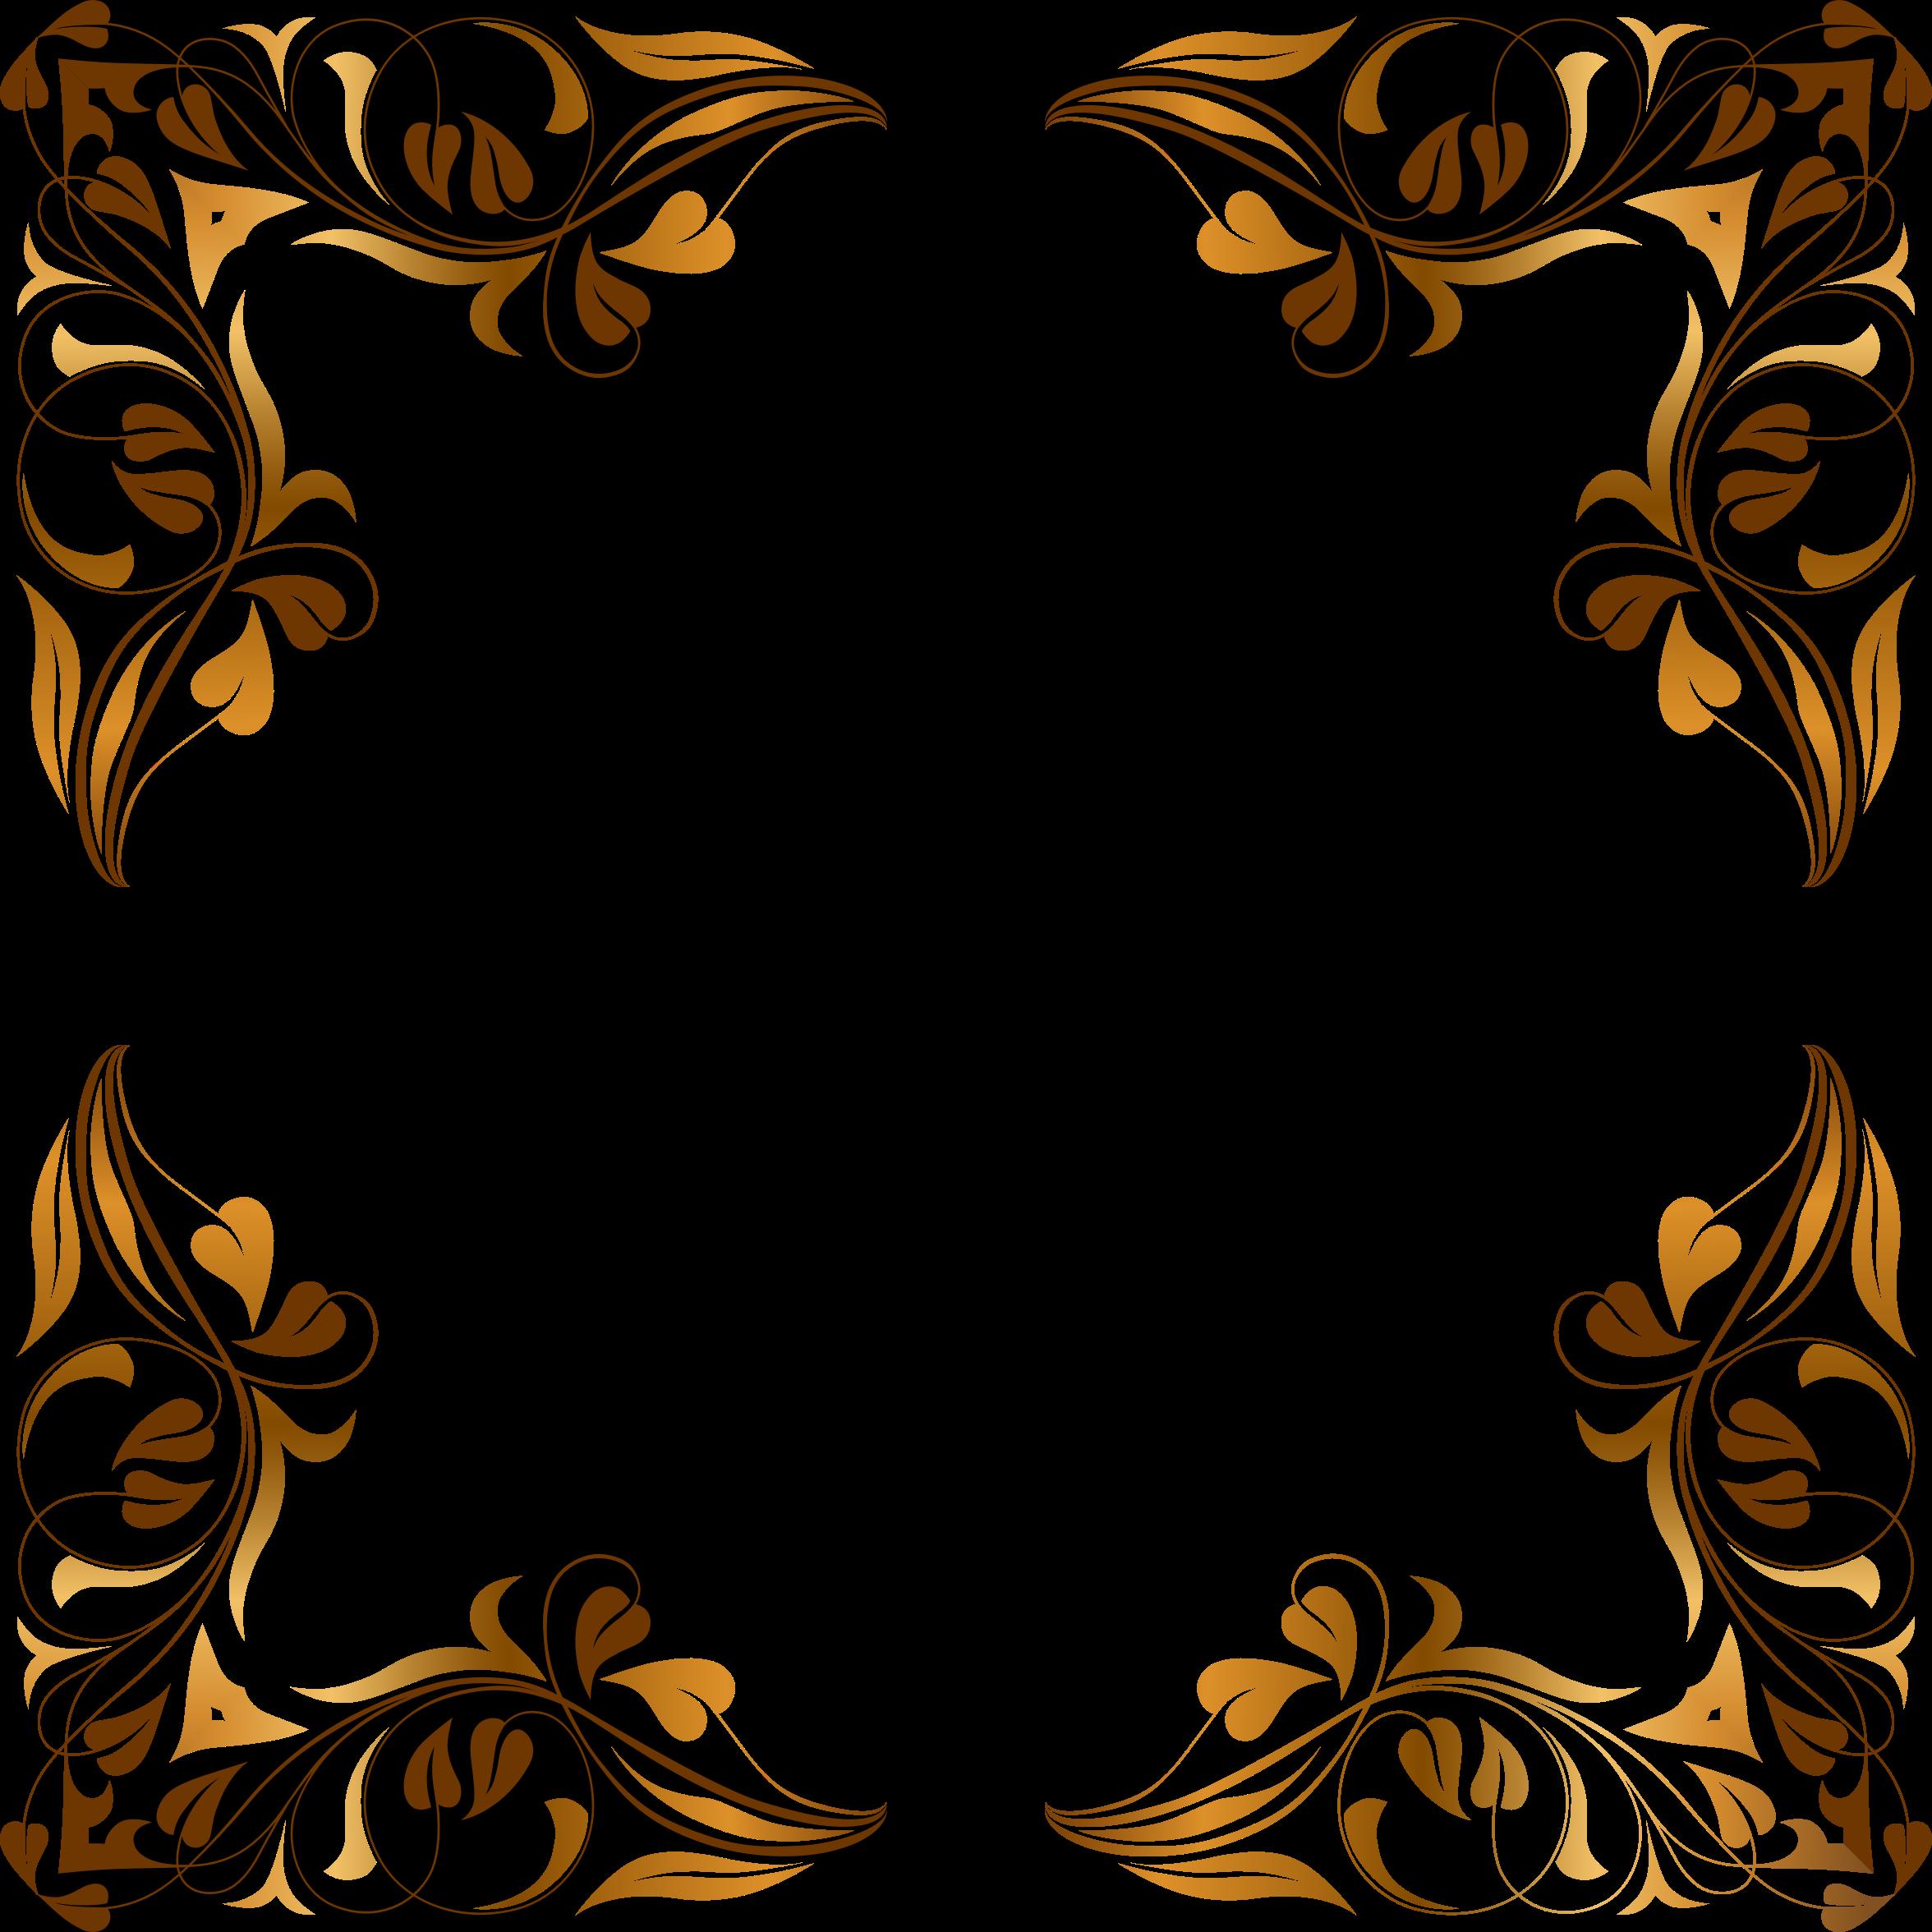 Clipart - Floral Flourish Frame 5